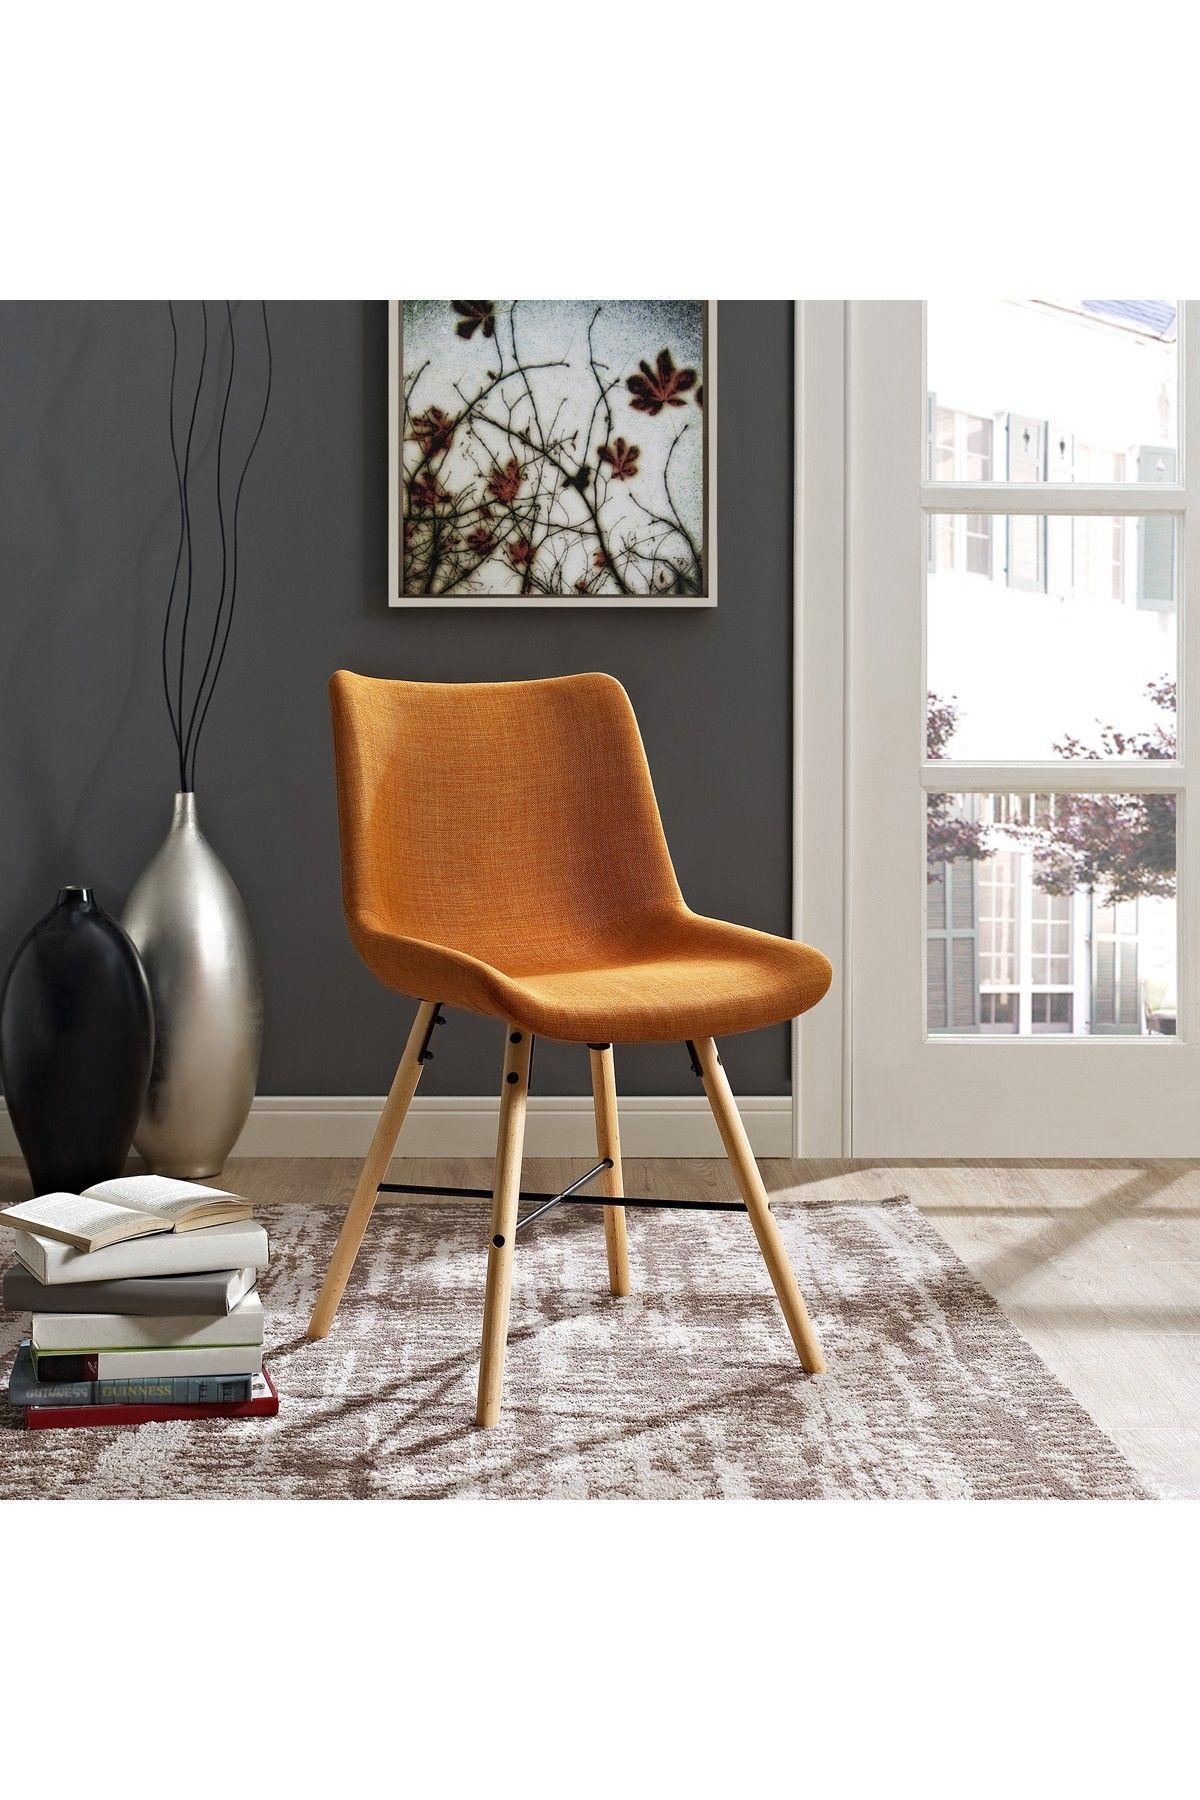 Walker Edison Furniture Company   Upholstered Linen Orange Side Chair   Set  Of 2 Is Now